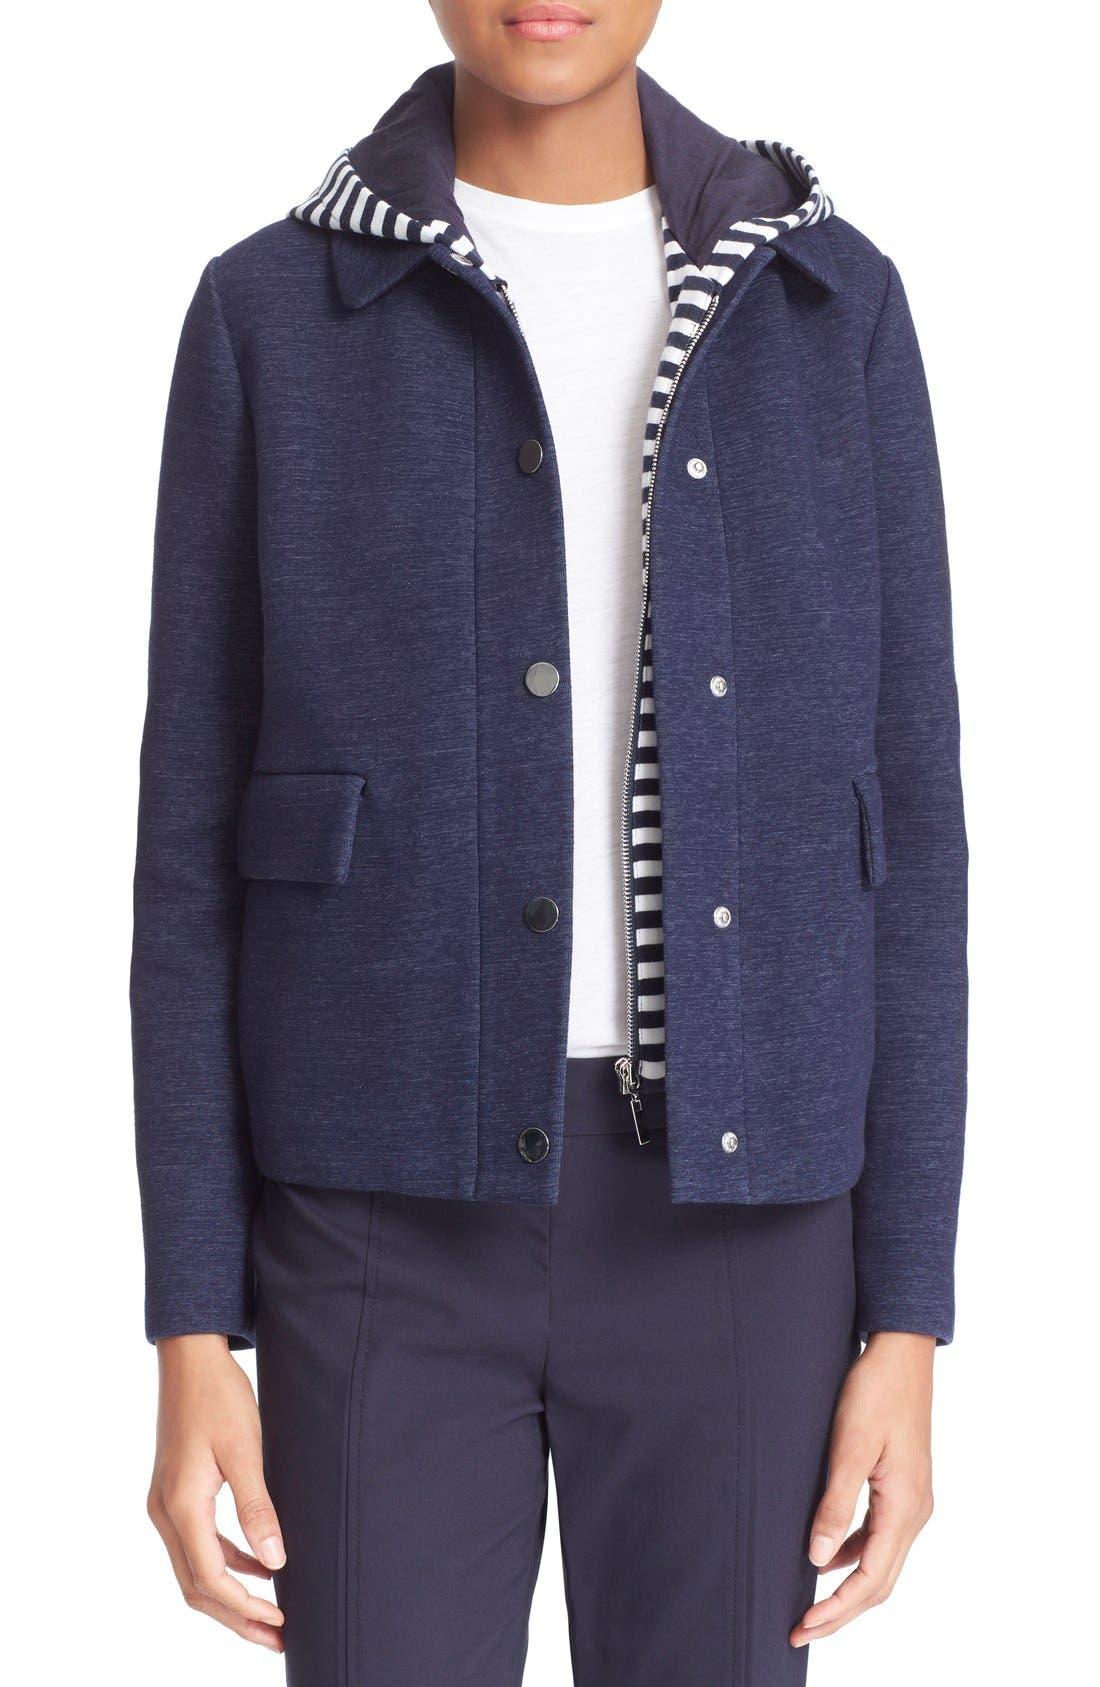 Alternate Image 1 Selected - Tory Burch Hooded Jacket